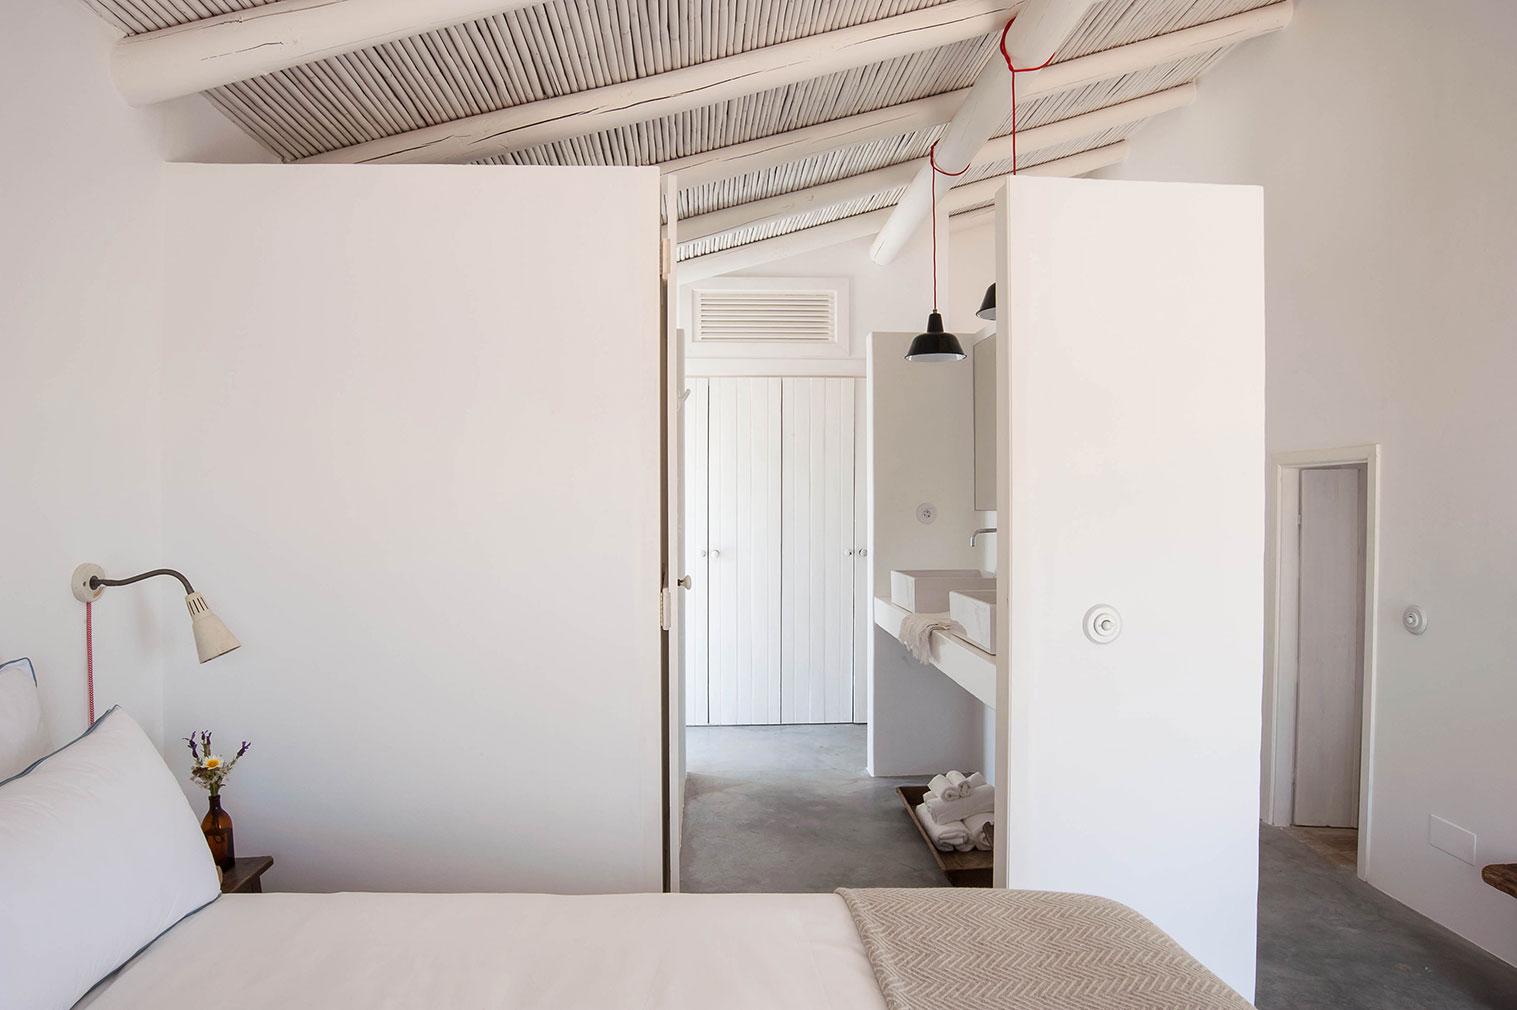 by Portuguese architecture practice Atelier Rua